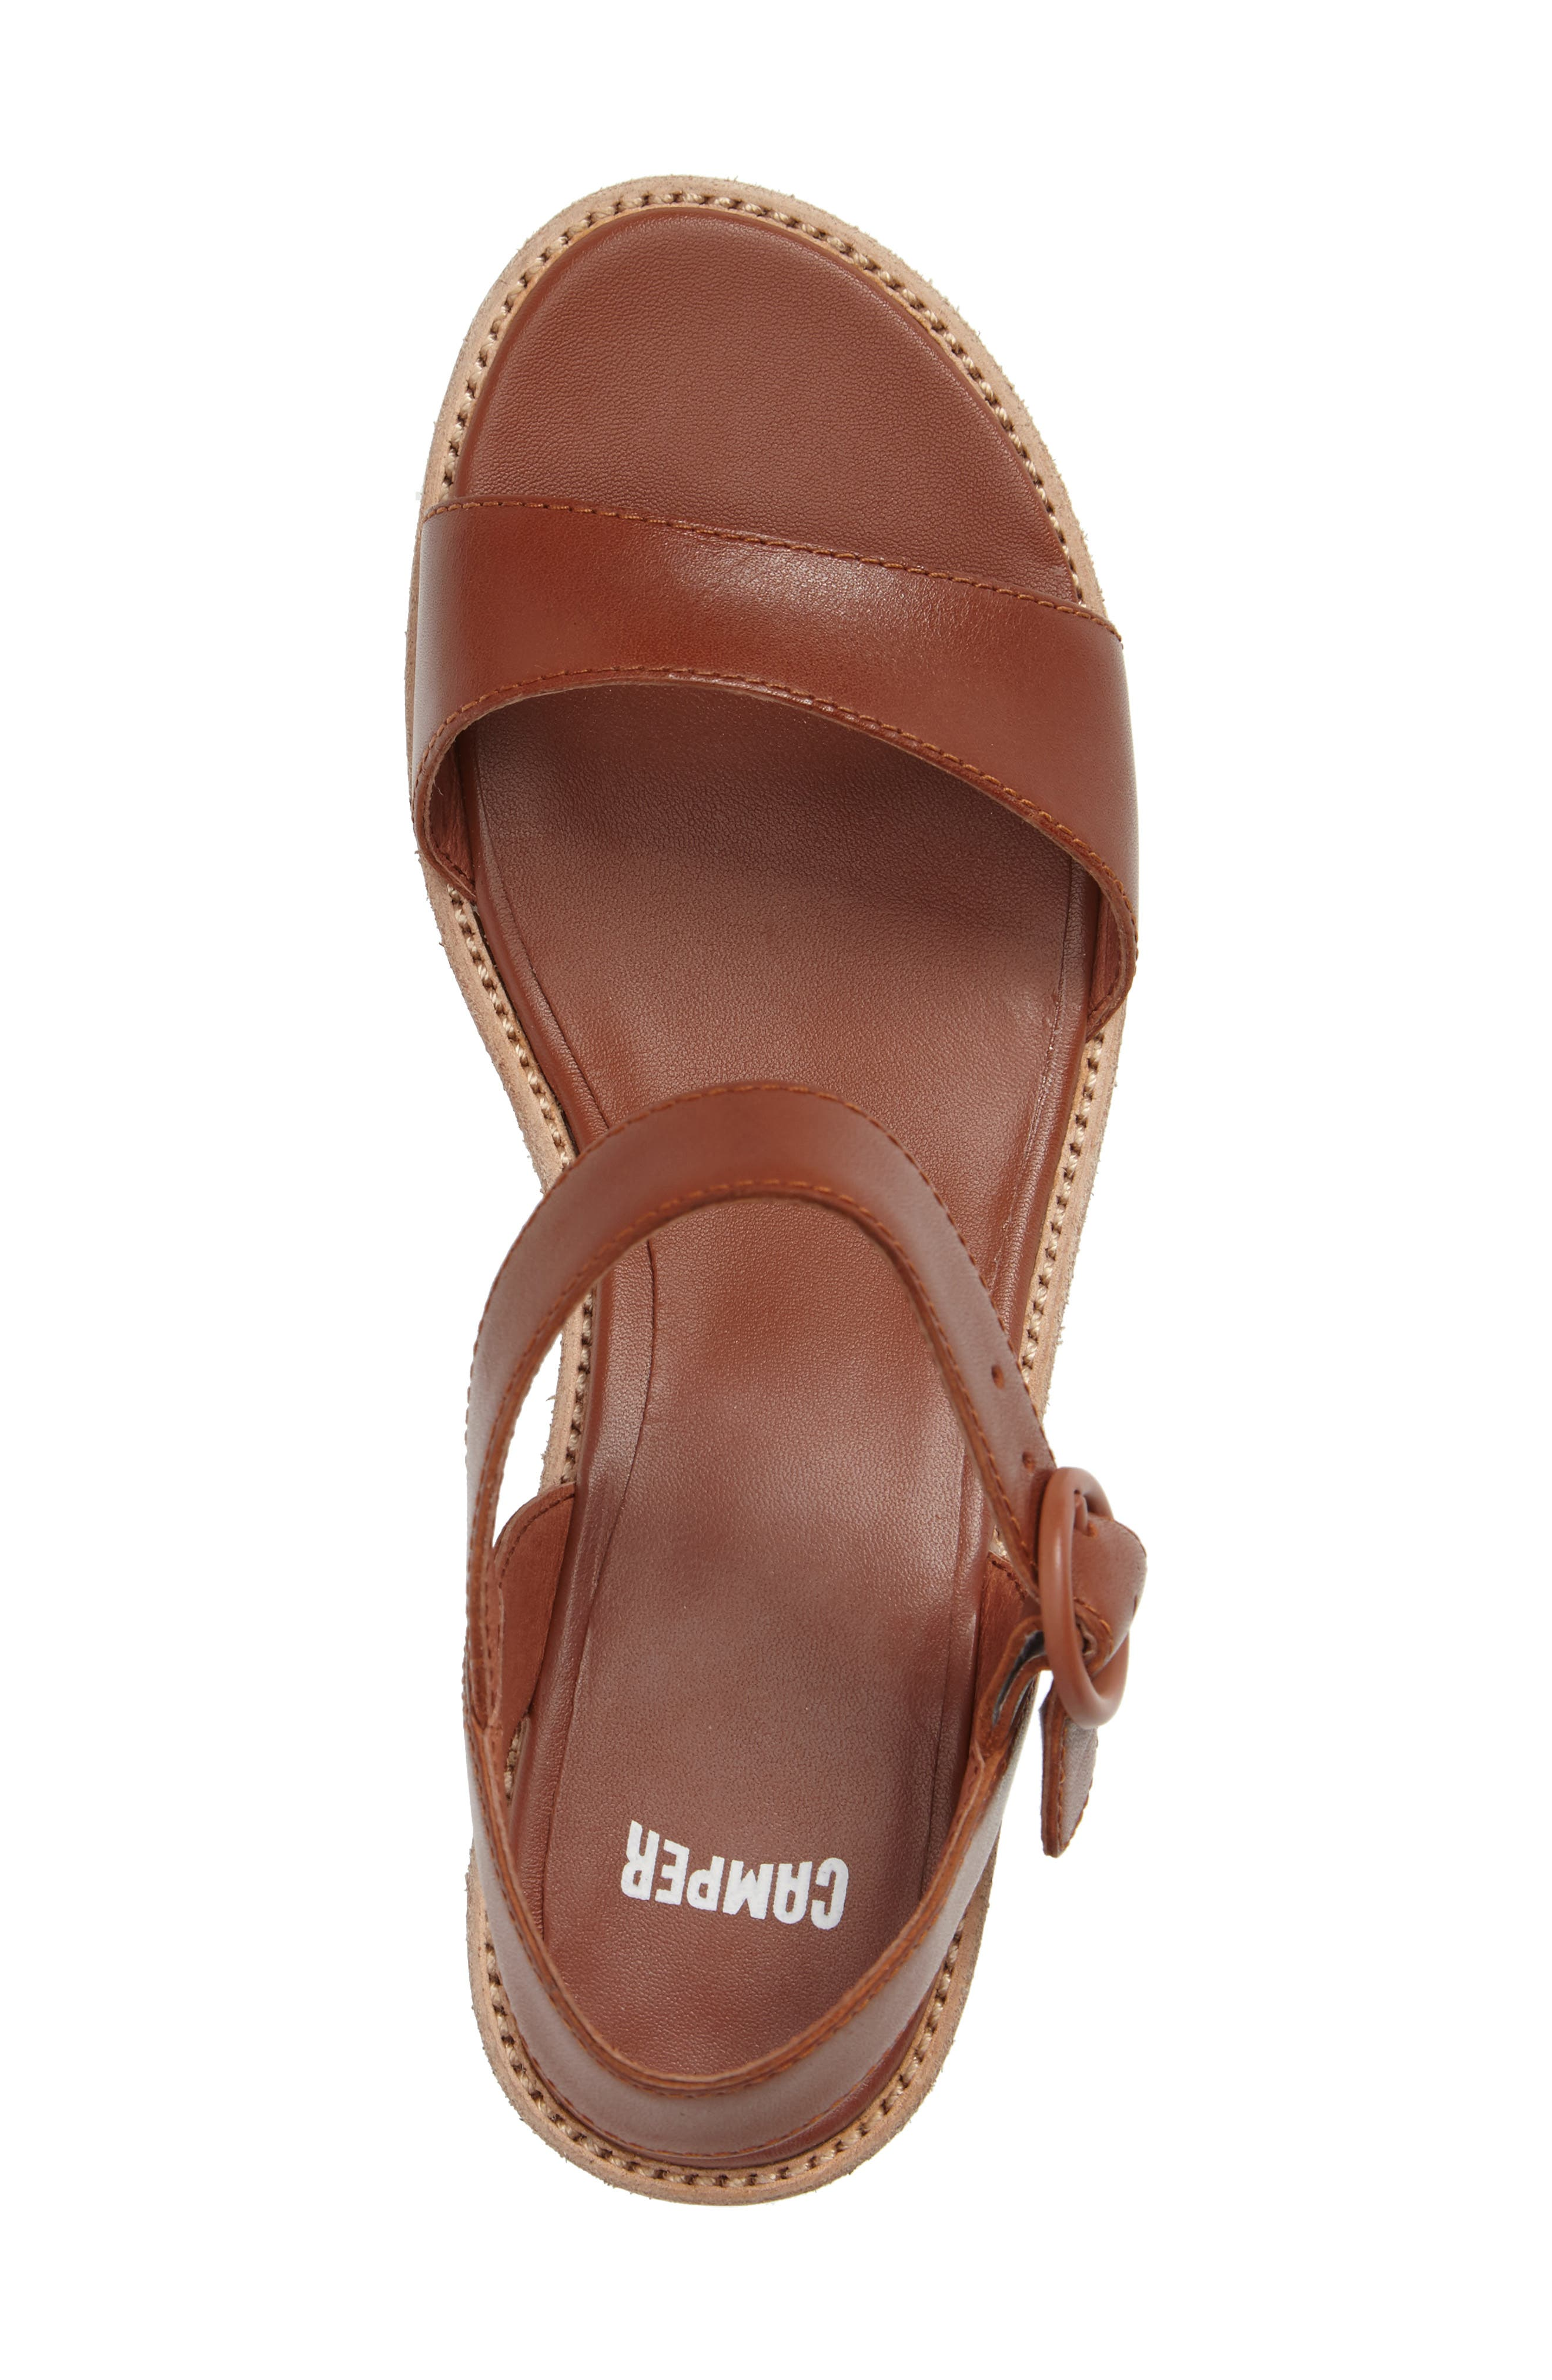 'Damas' Wedge Sandal,                             Alternate thumbnail 30, color,